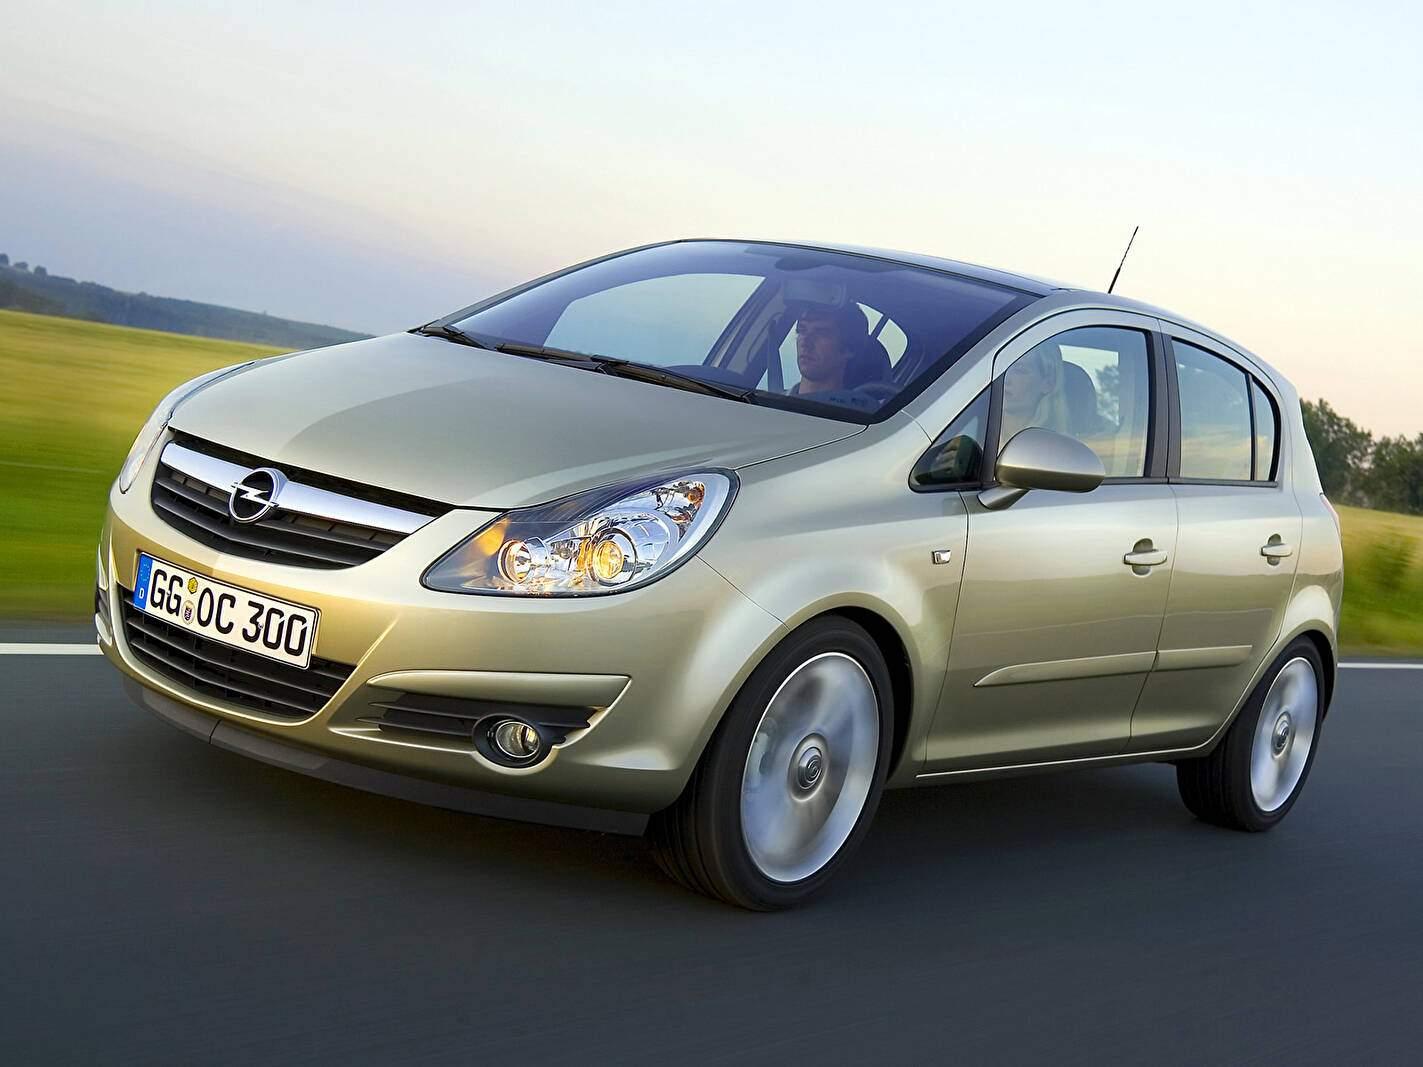 Opel Corsa IV 1.4 Twinport 90 (2006-2009),  ajouté par fox58